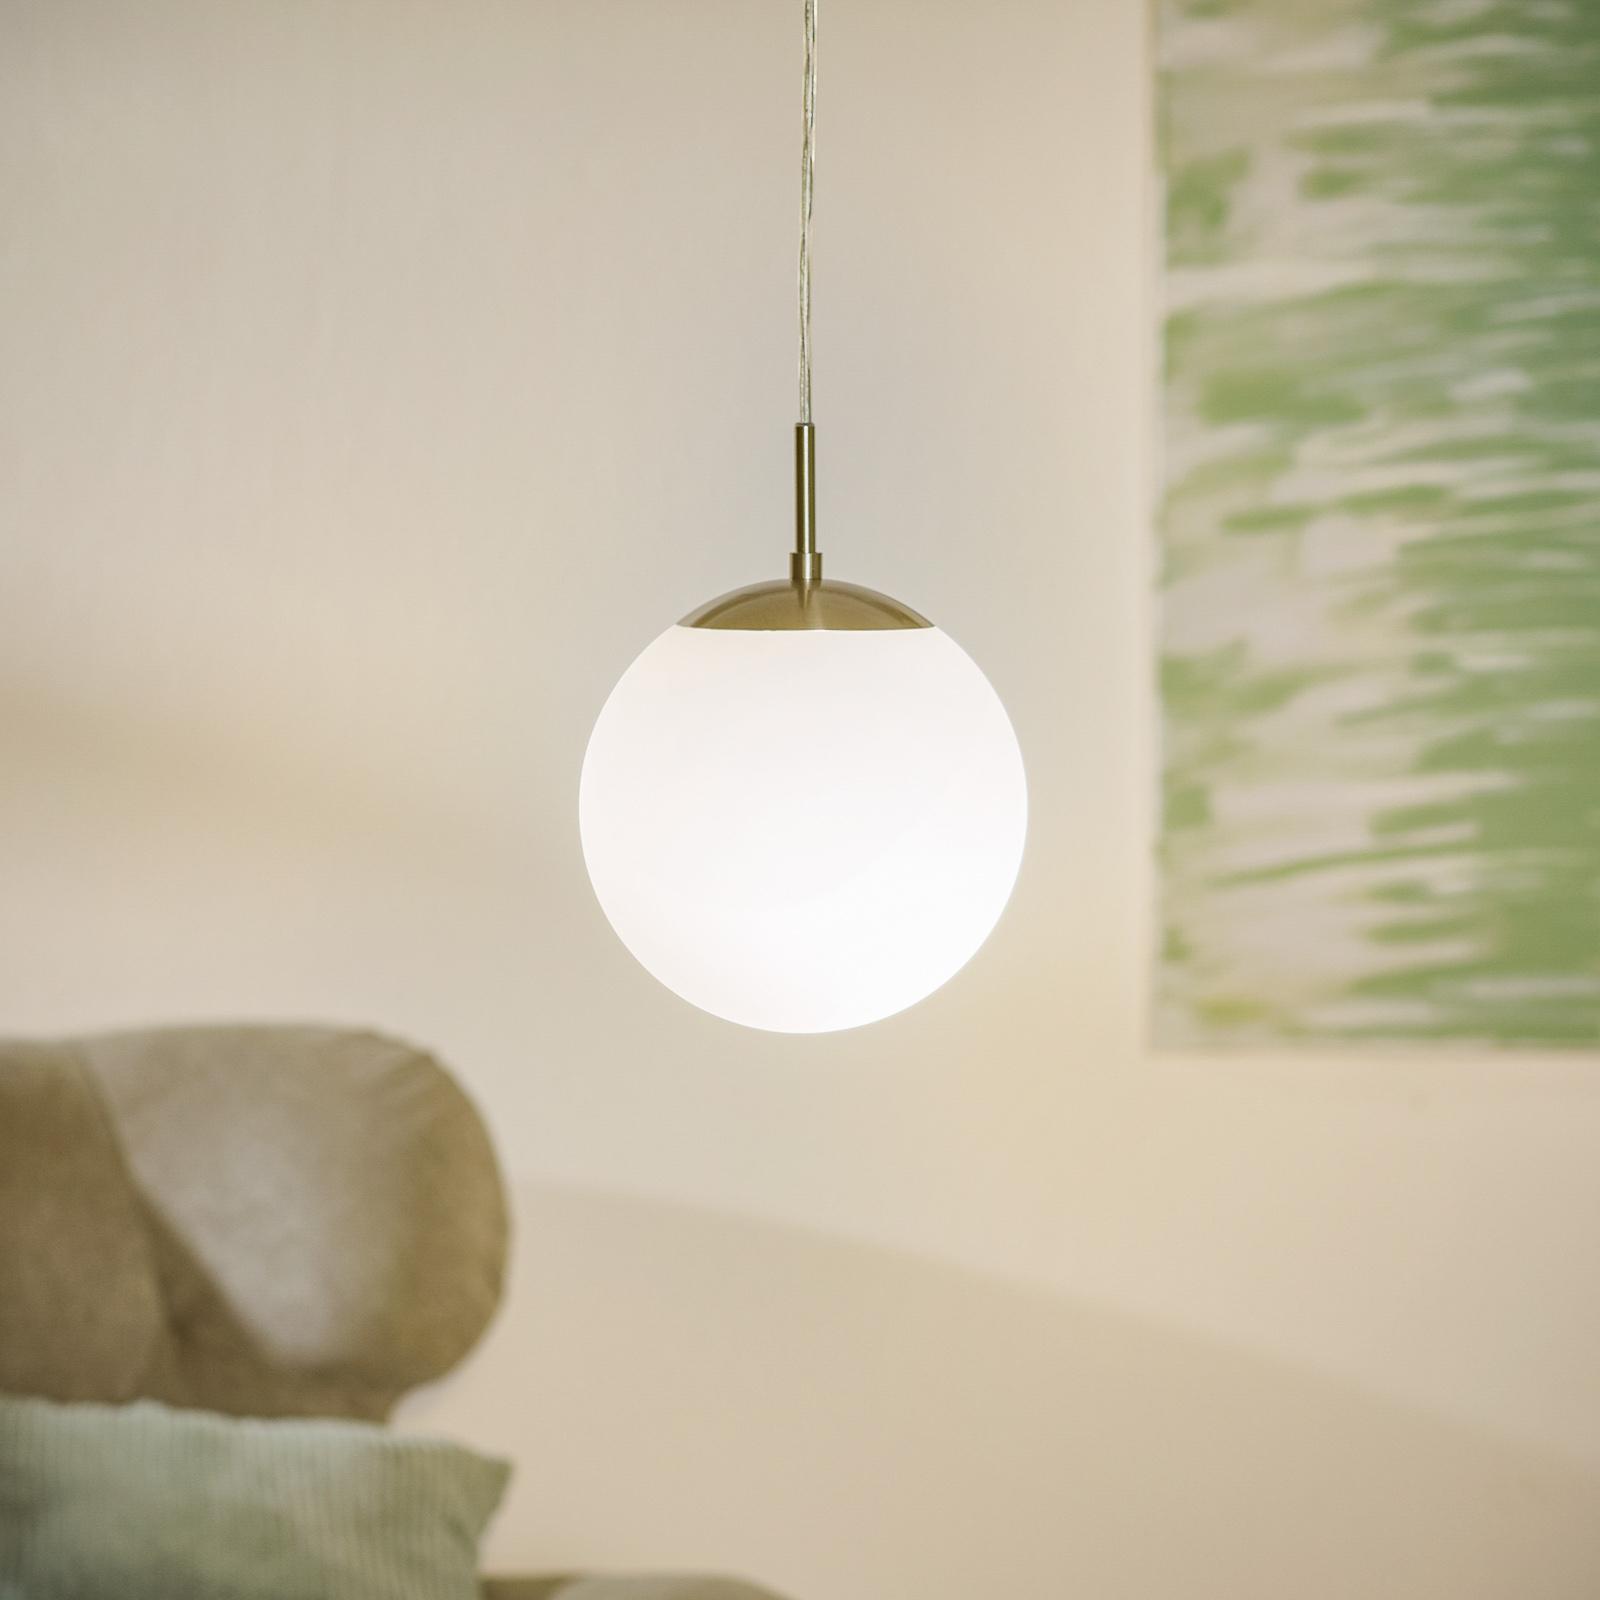 Závesná lampa Rondo_3031252_1